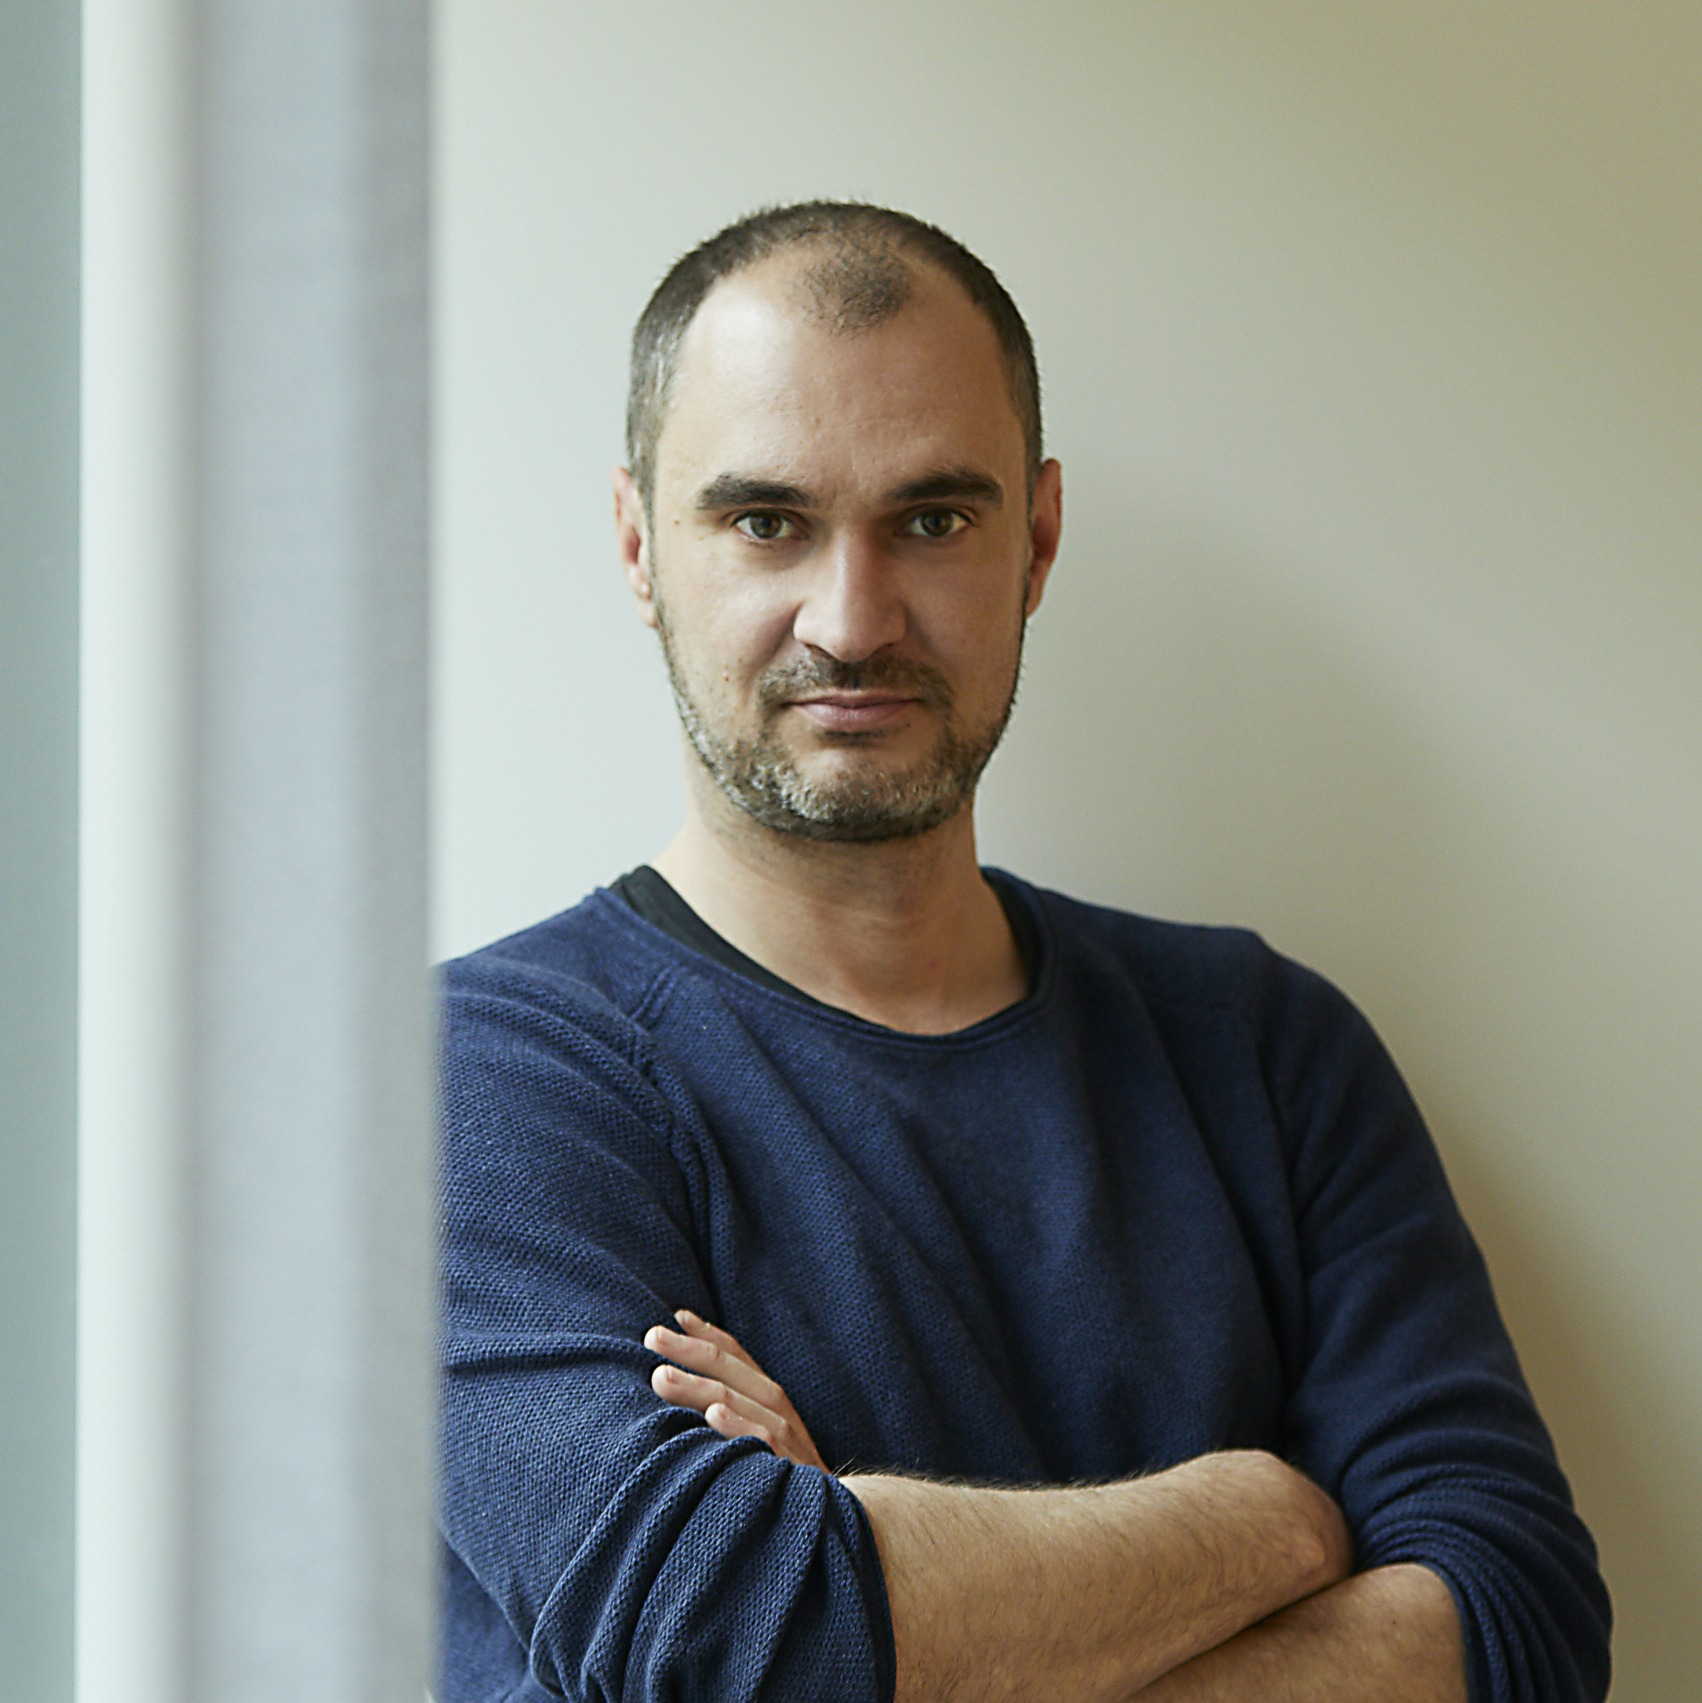 Frank Schönfeld